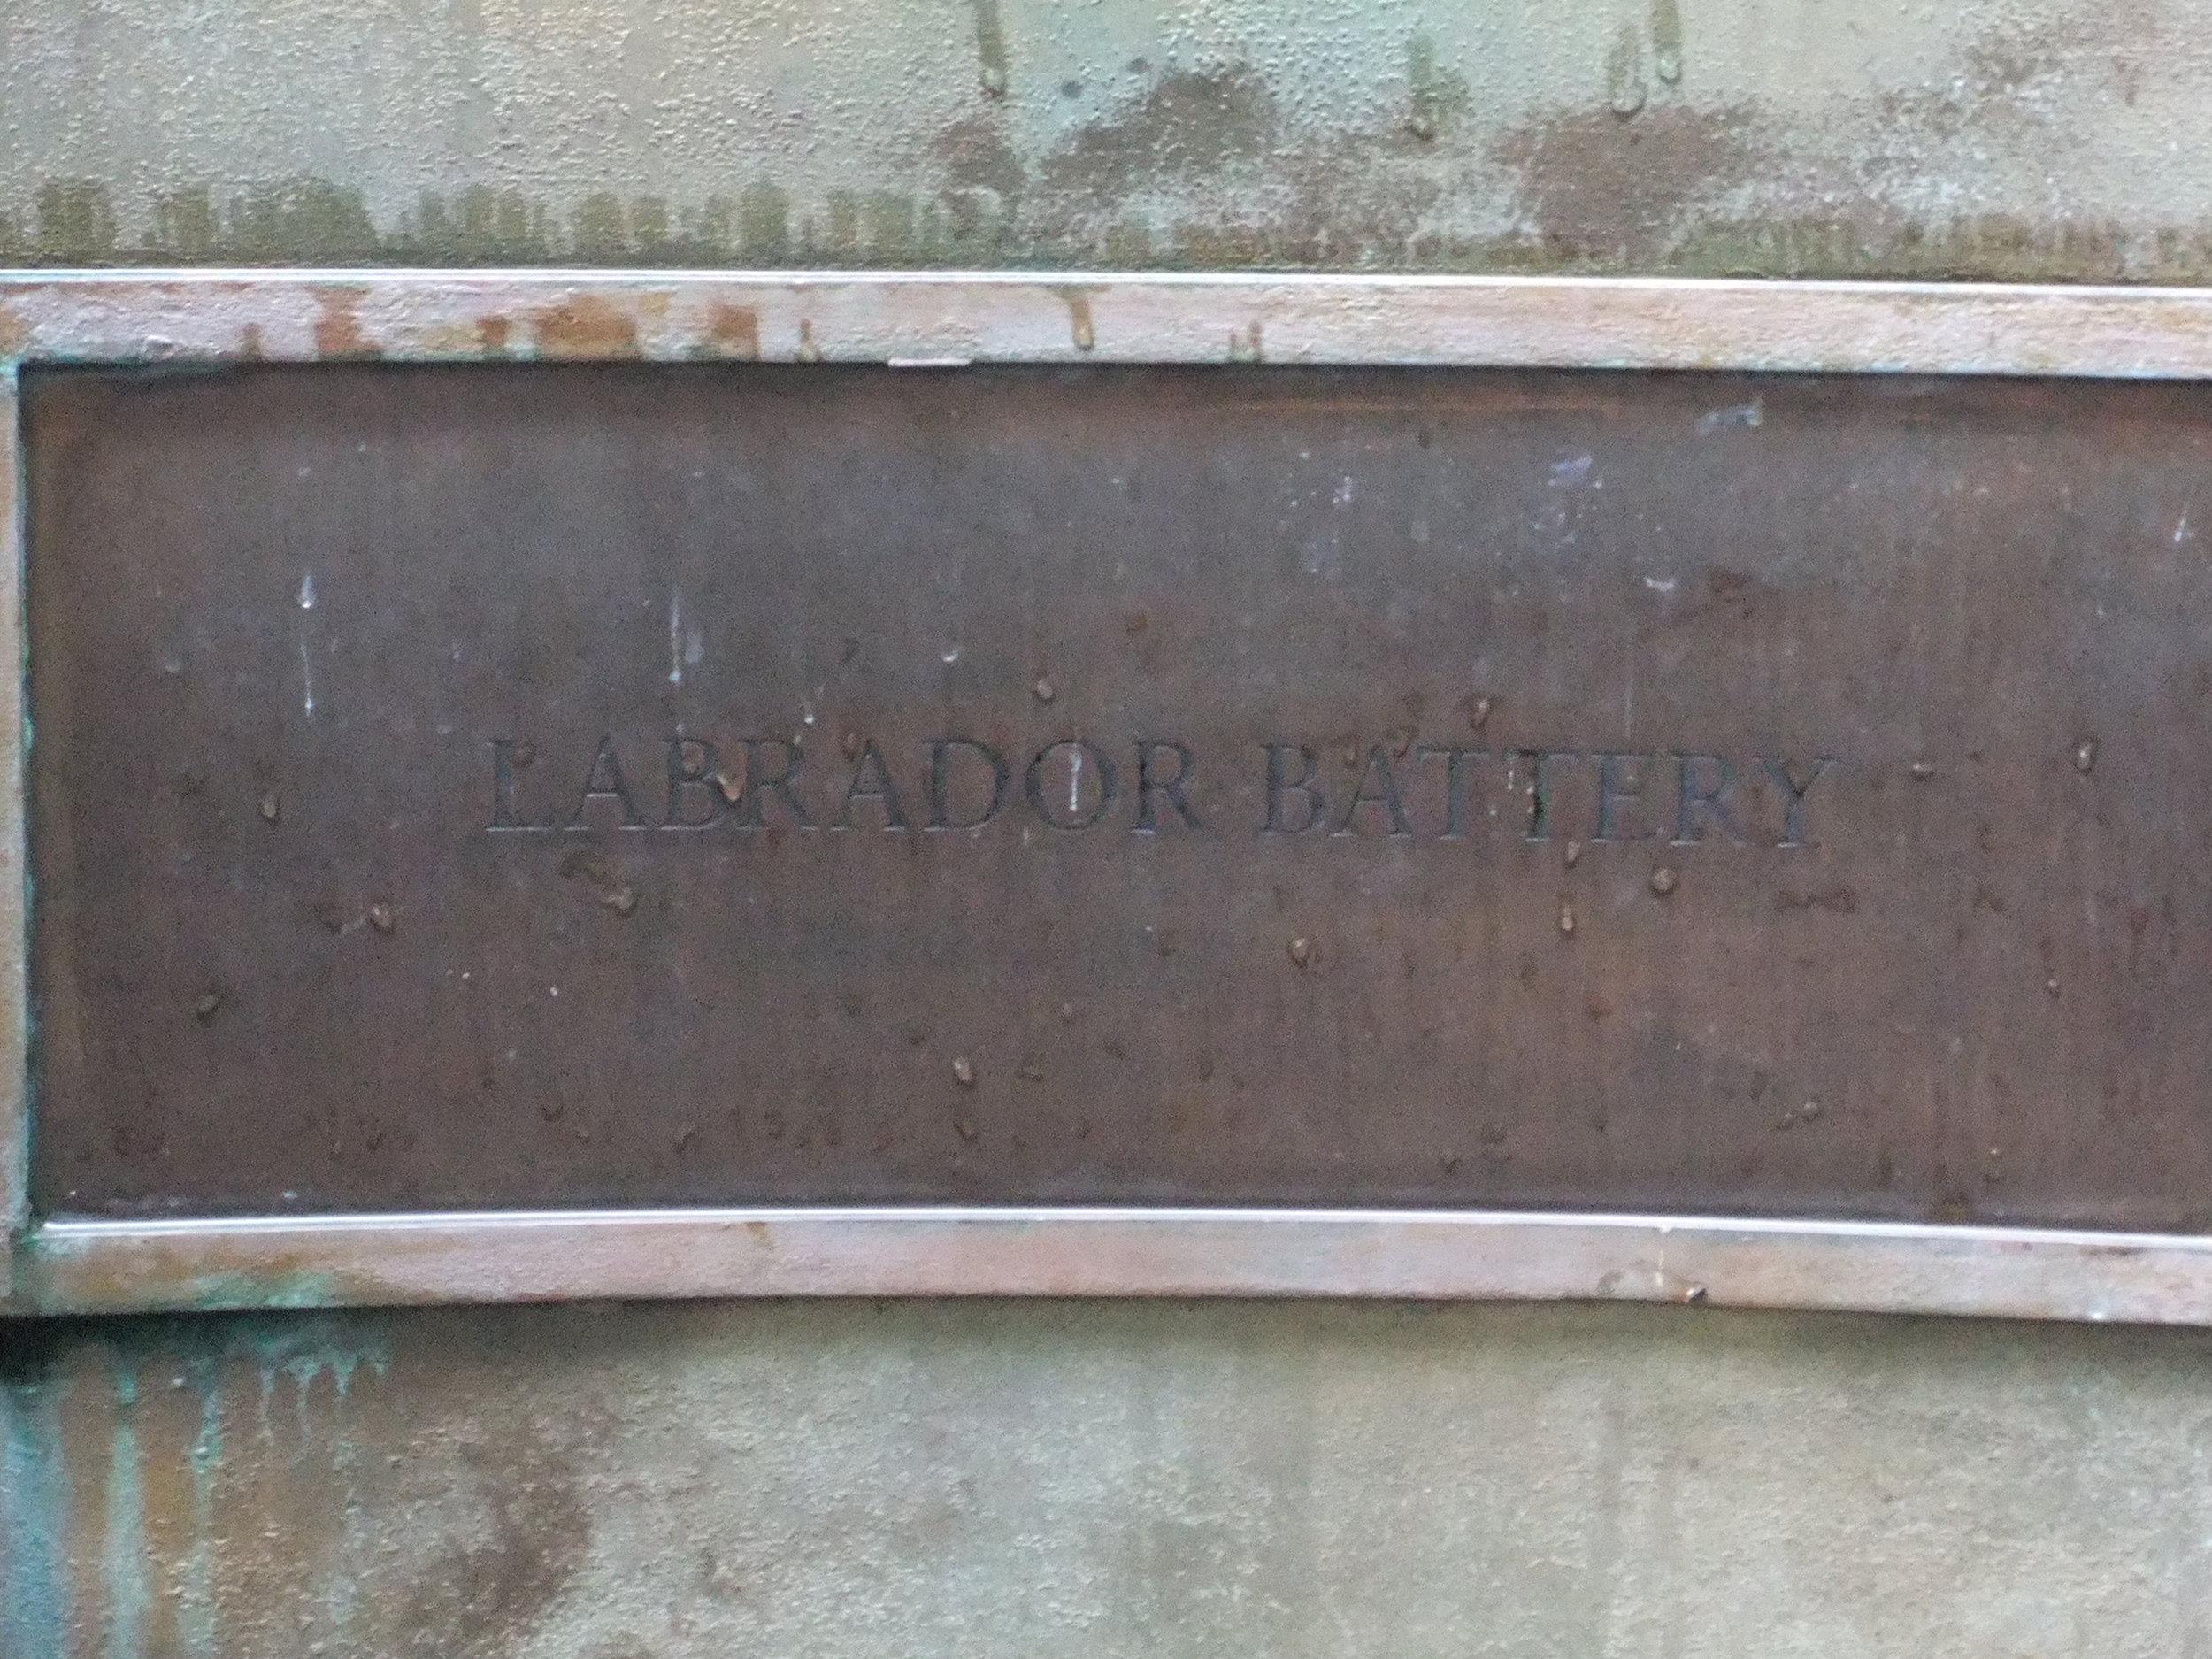 Labrador Battery Memorial, Labrador Park